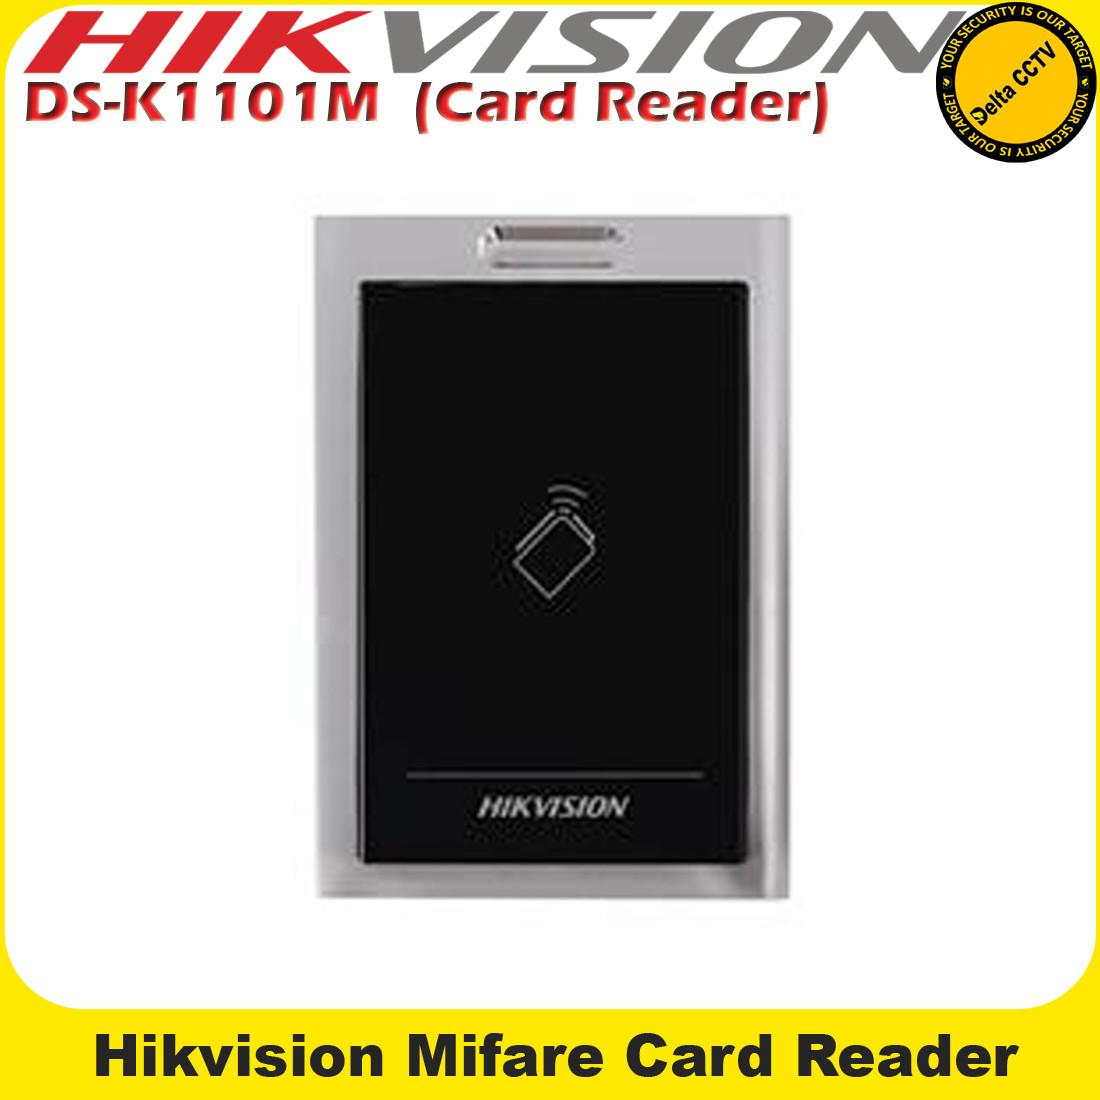 Hikvision DS-K1101M Mifare Card Reader Built-in audible